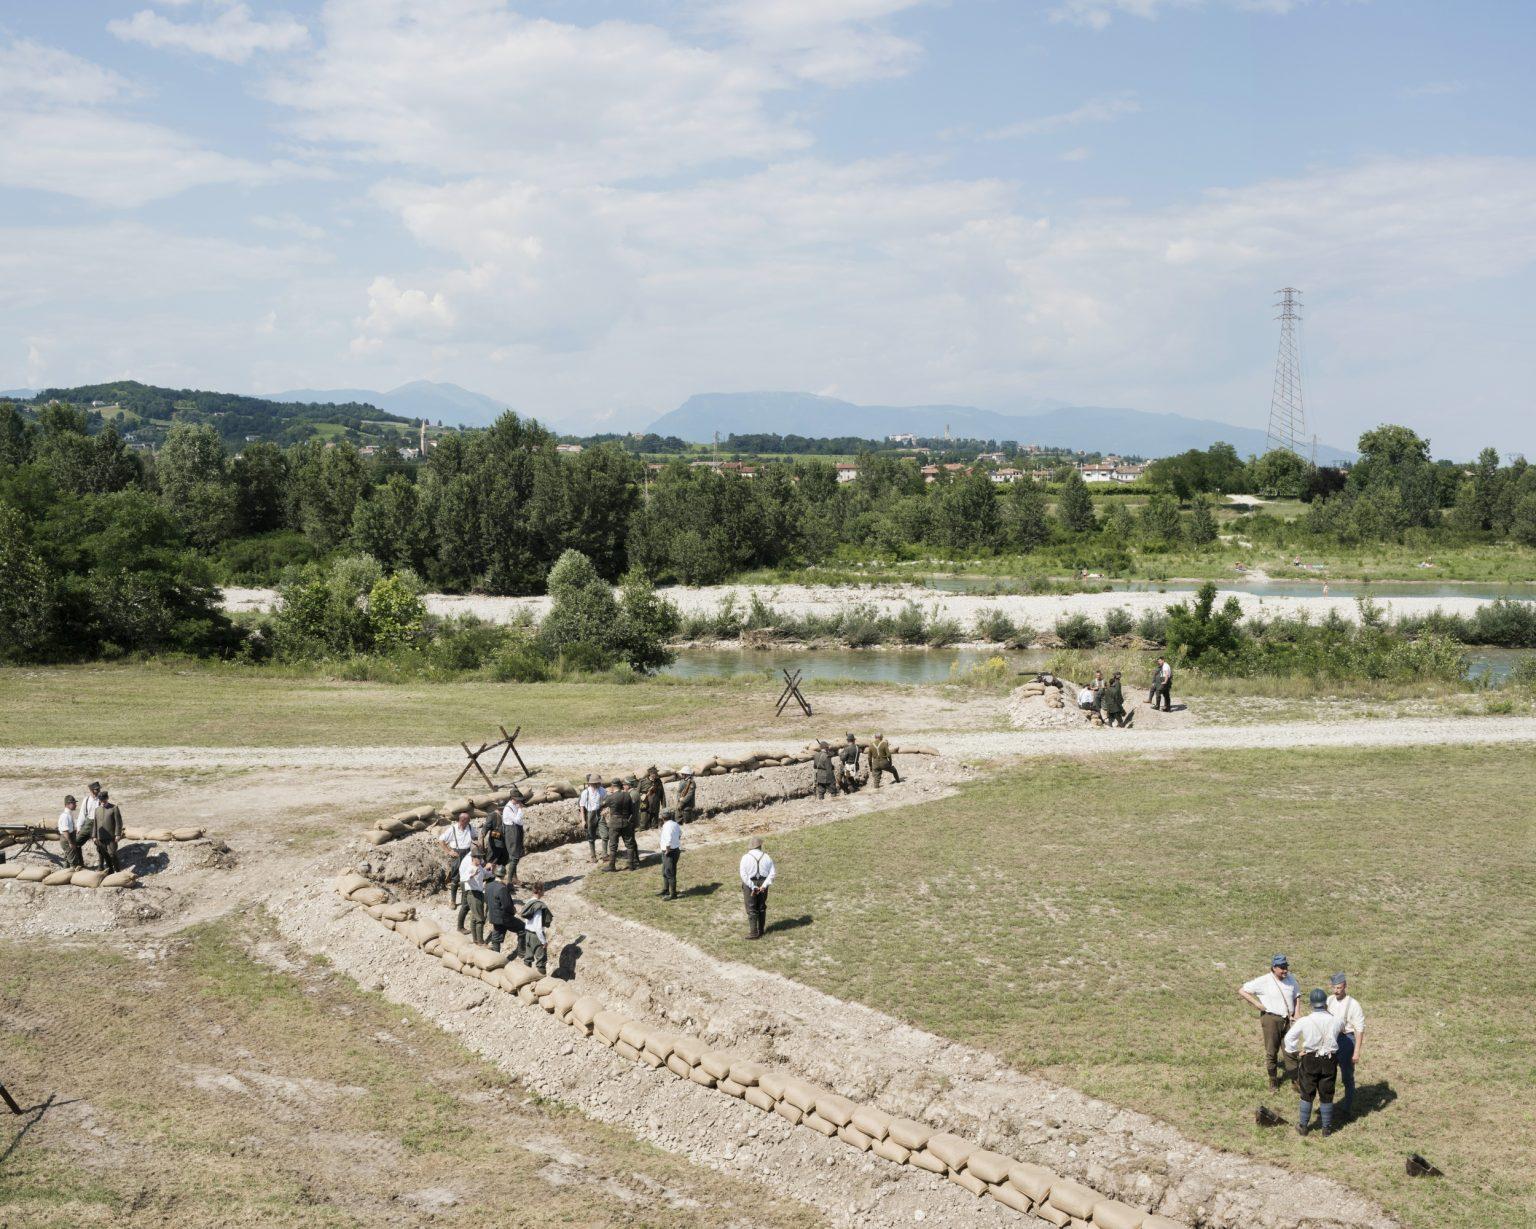 Nervesa della battaglia (Treviso). Re enactment of the second battle of the Piave river. Re enactors prepare the field before the battle begins.